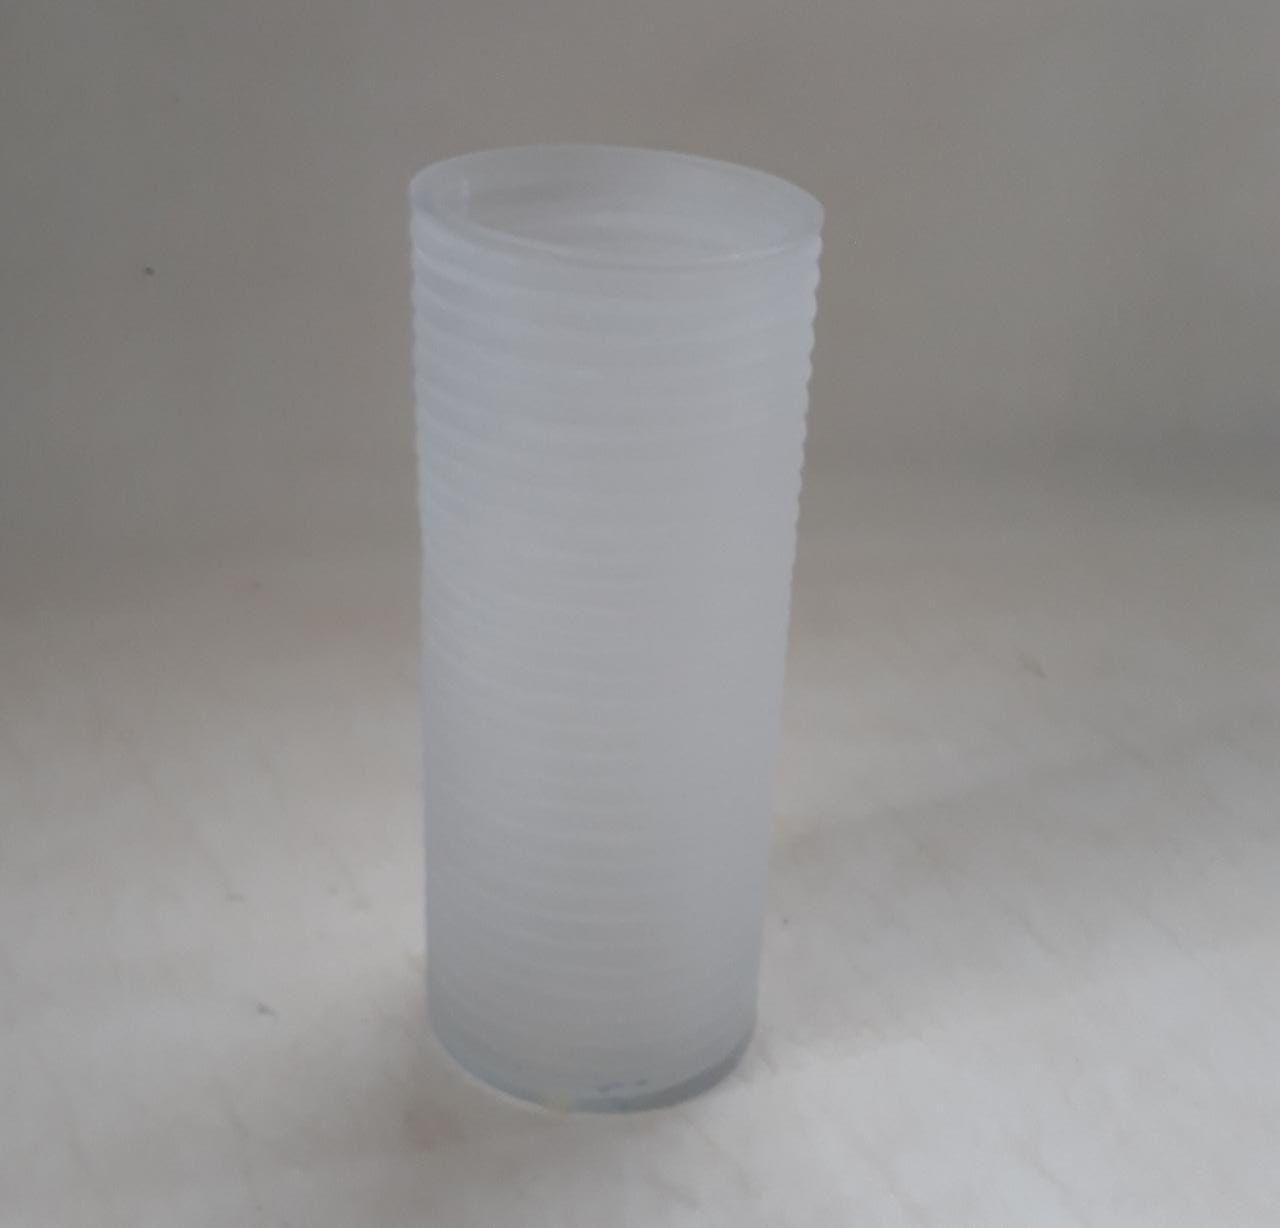 Vaso Cilindro Friso Branco Fosco